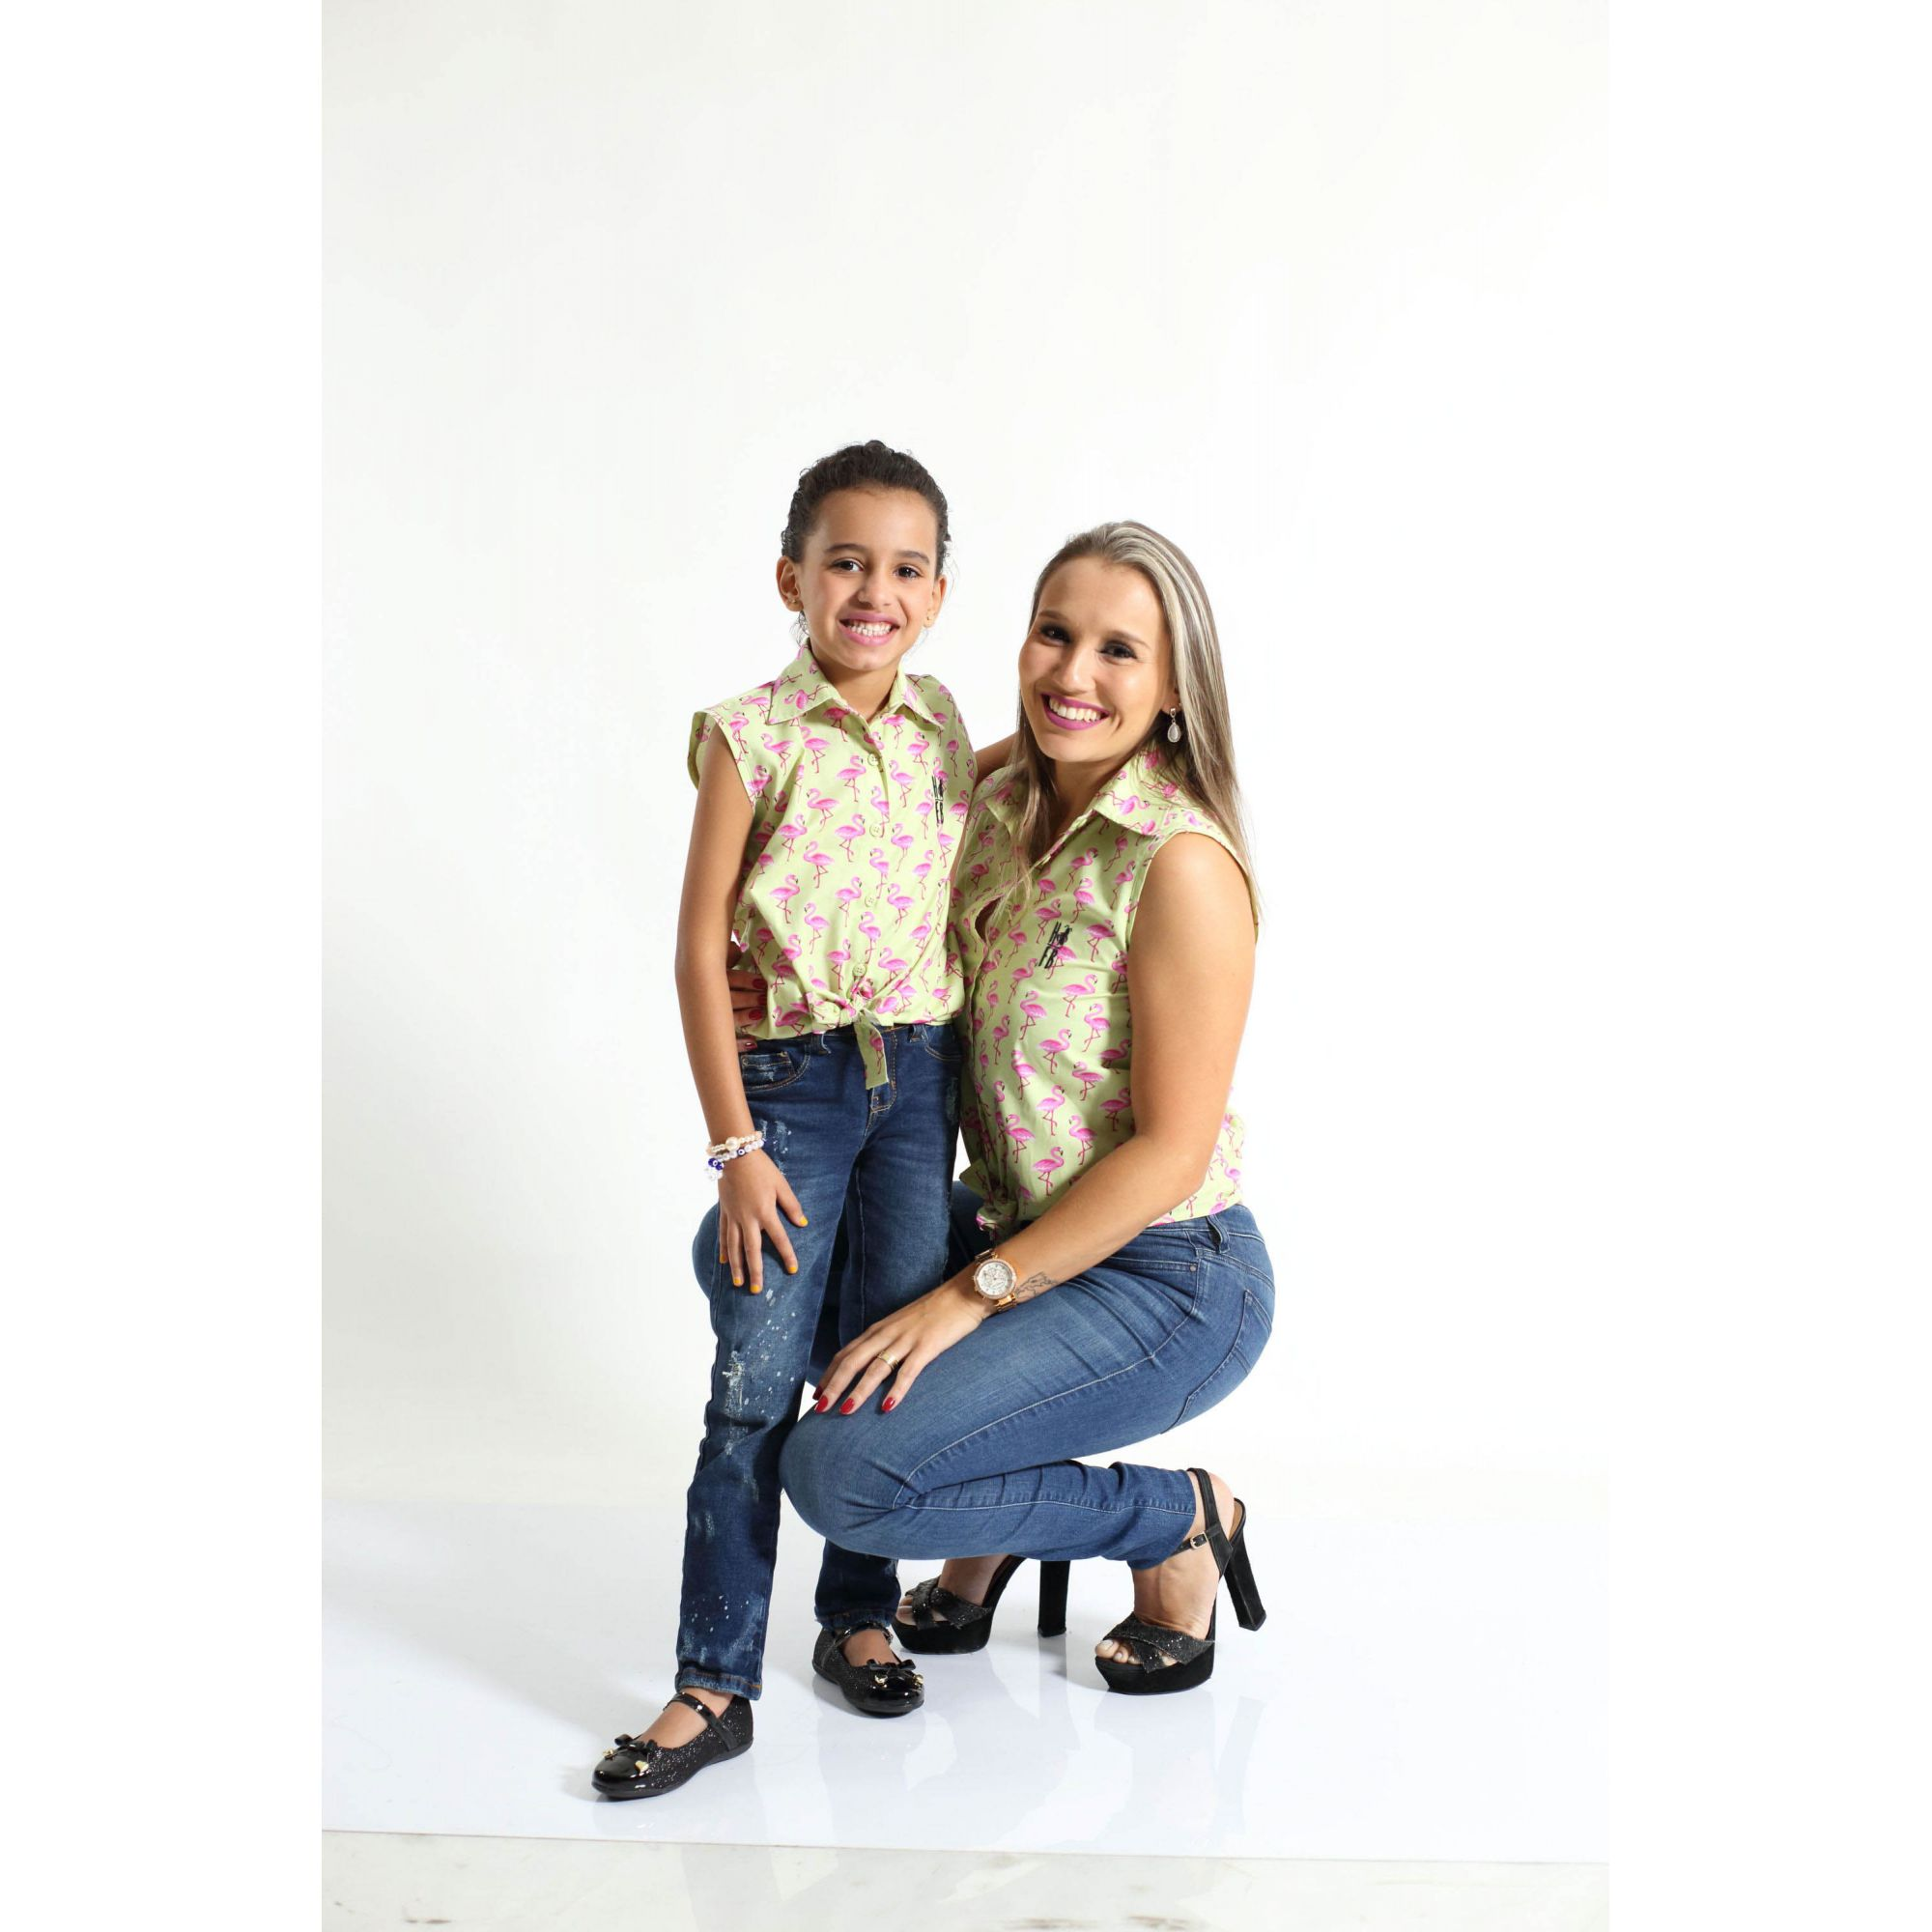 MÃE E FILHA > Kit 02 Camisas Social Adulto e Infantil Flamingos [Coleção Tal Mãe Tal Filha]